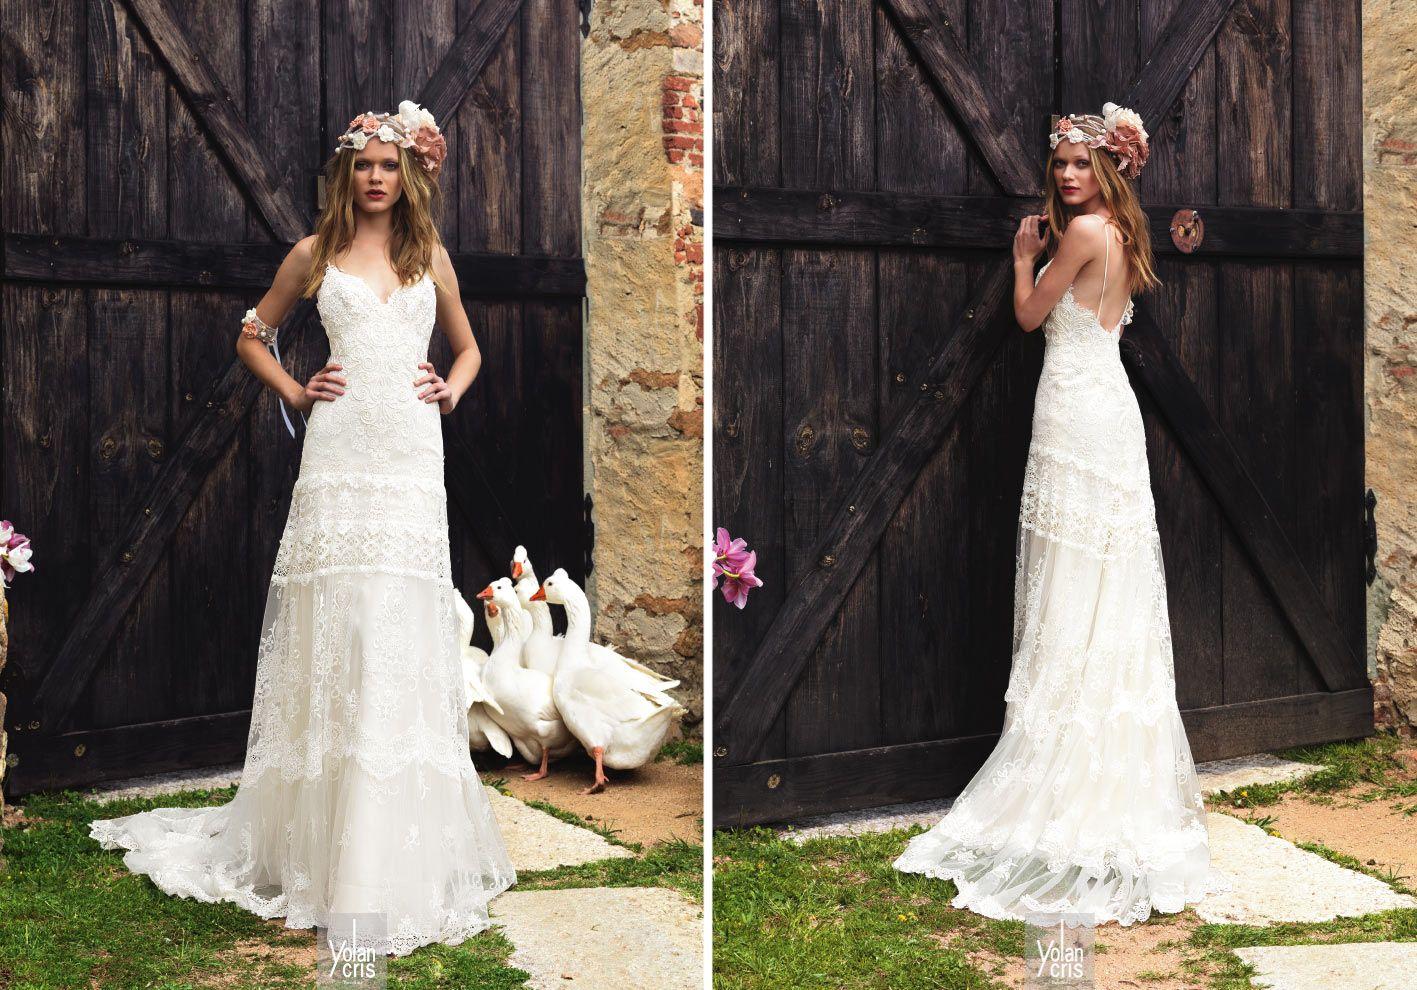 Yolancris bohemian wedding dresses wedding gown pt